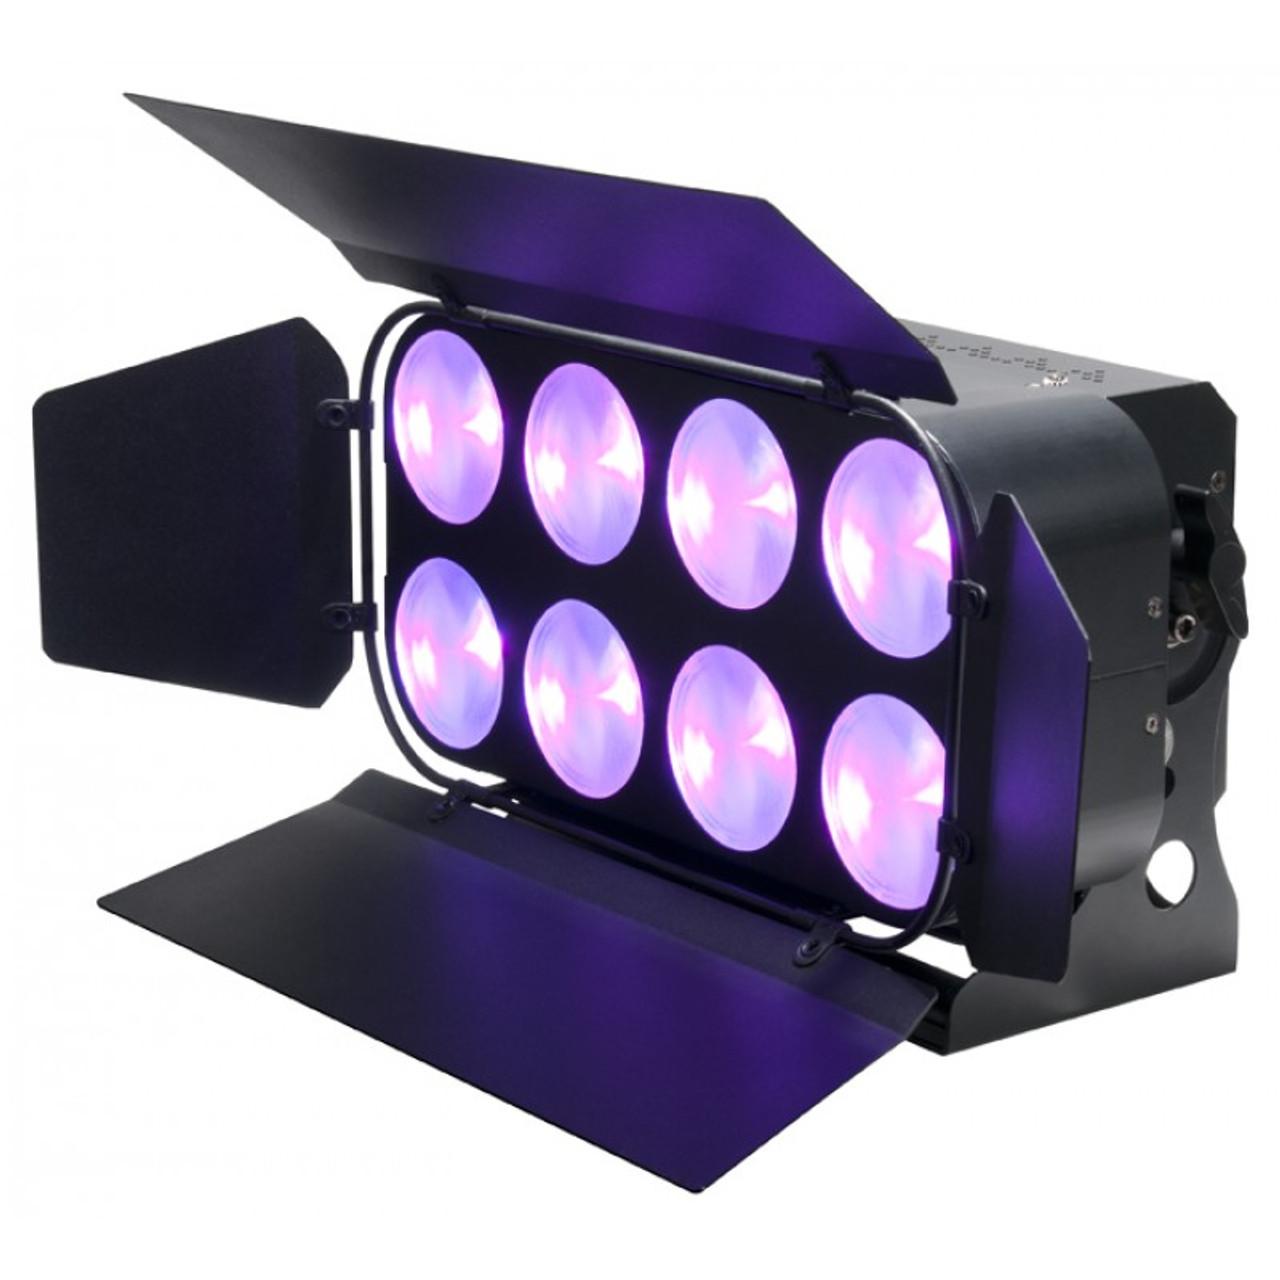 american dj adj dotz panel 2 4 wash blinder led light fixture 2 x